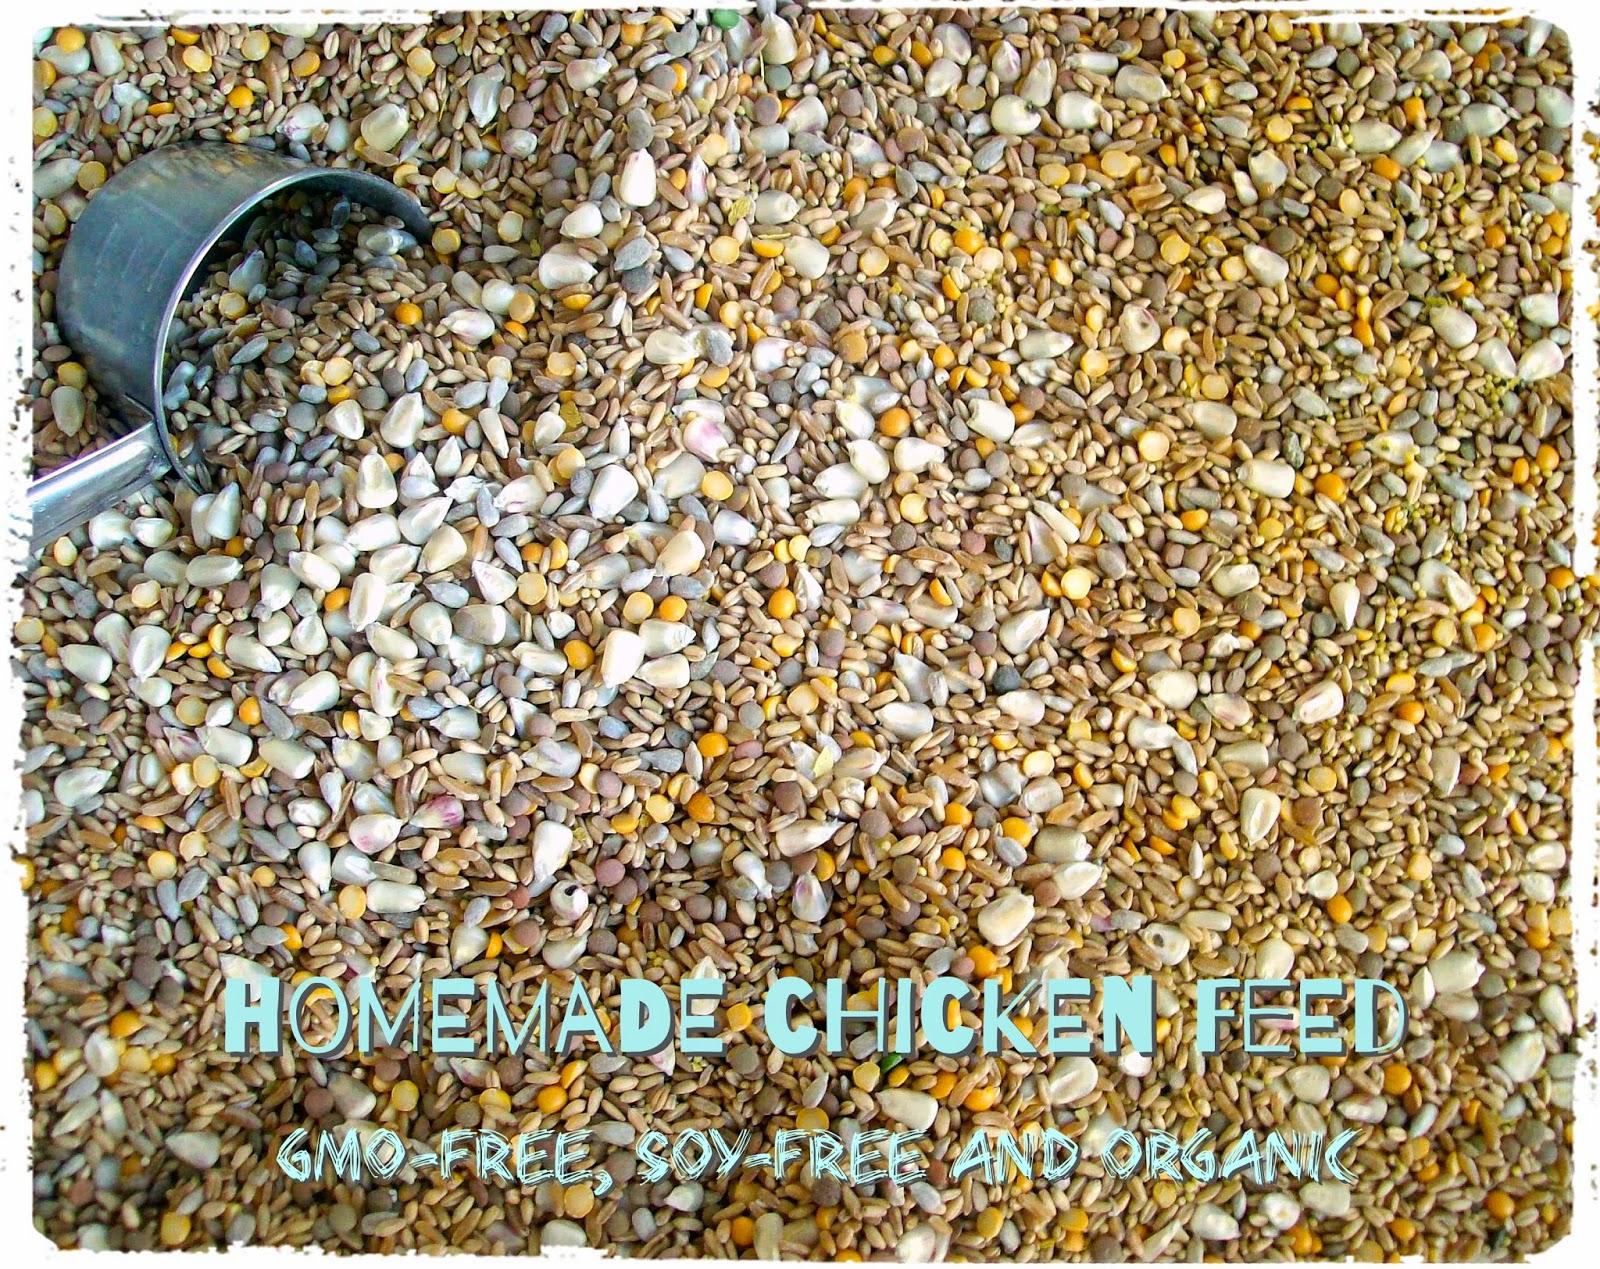 Organic, GMO-free Homemade Chicken Feed